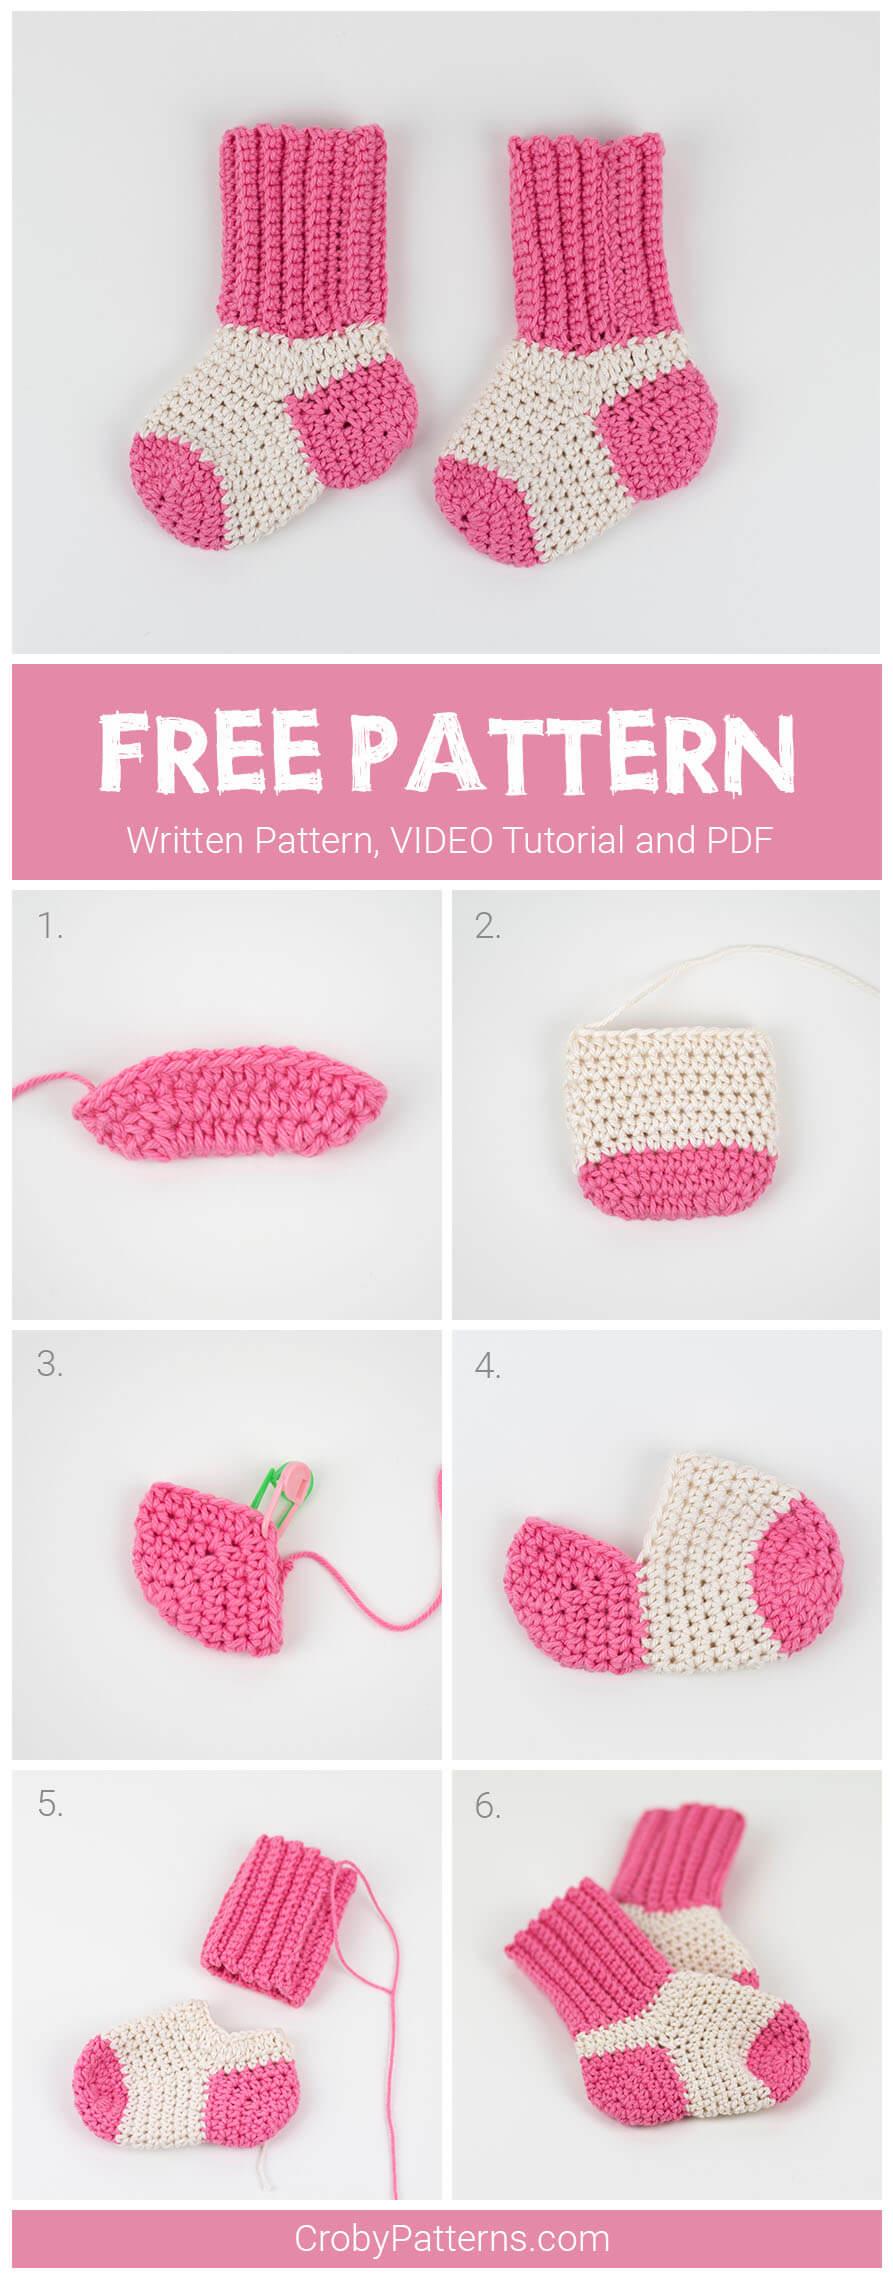 Two-Tone Crochet Baby Socks - Free